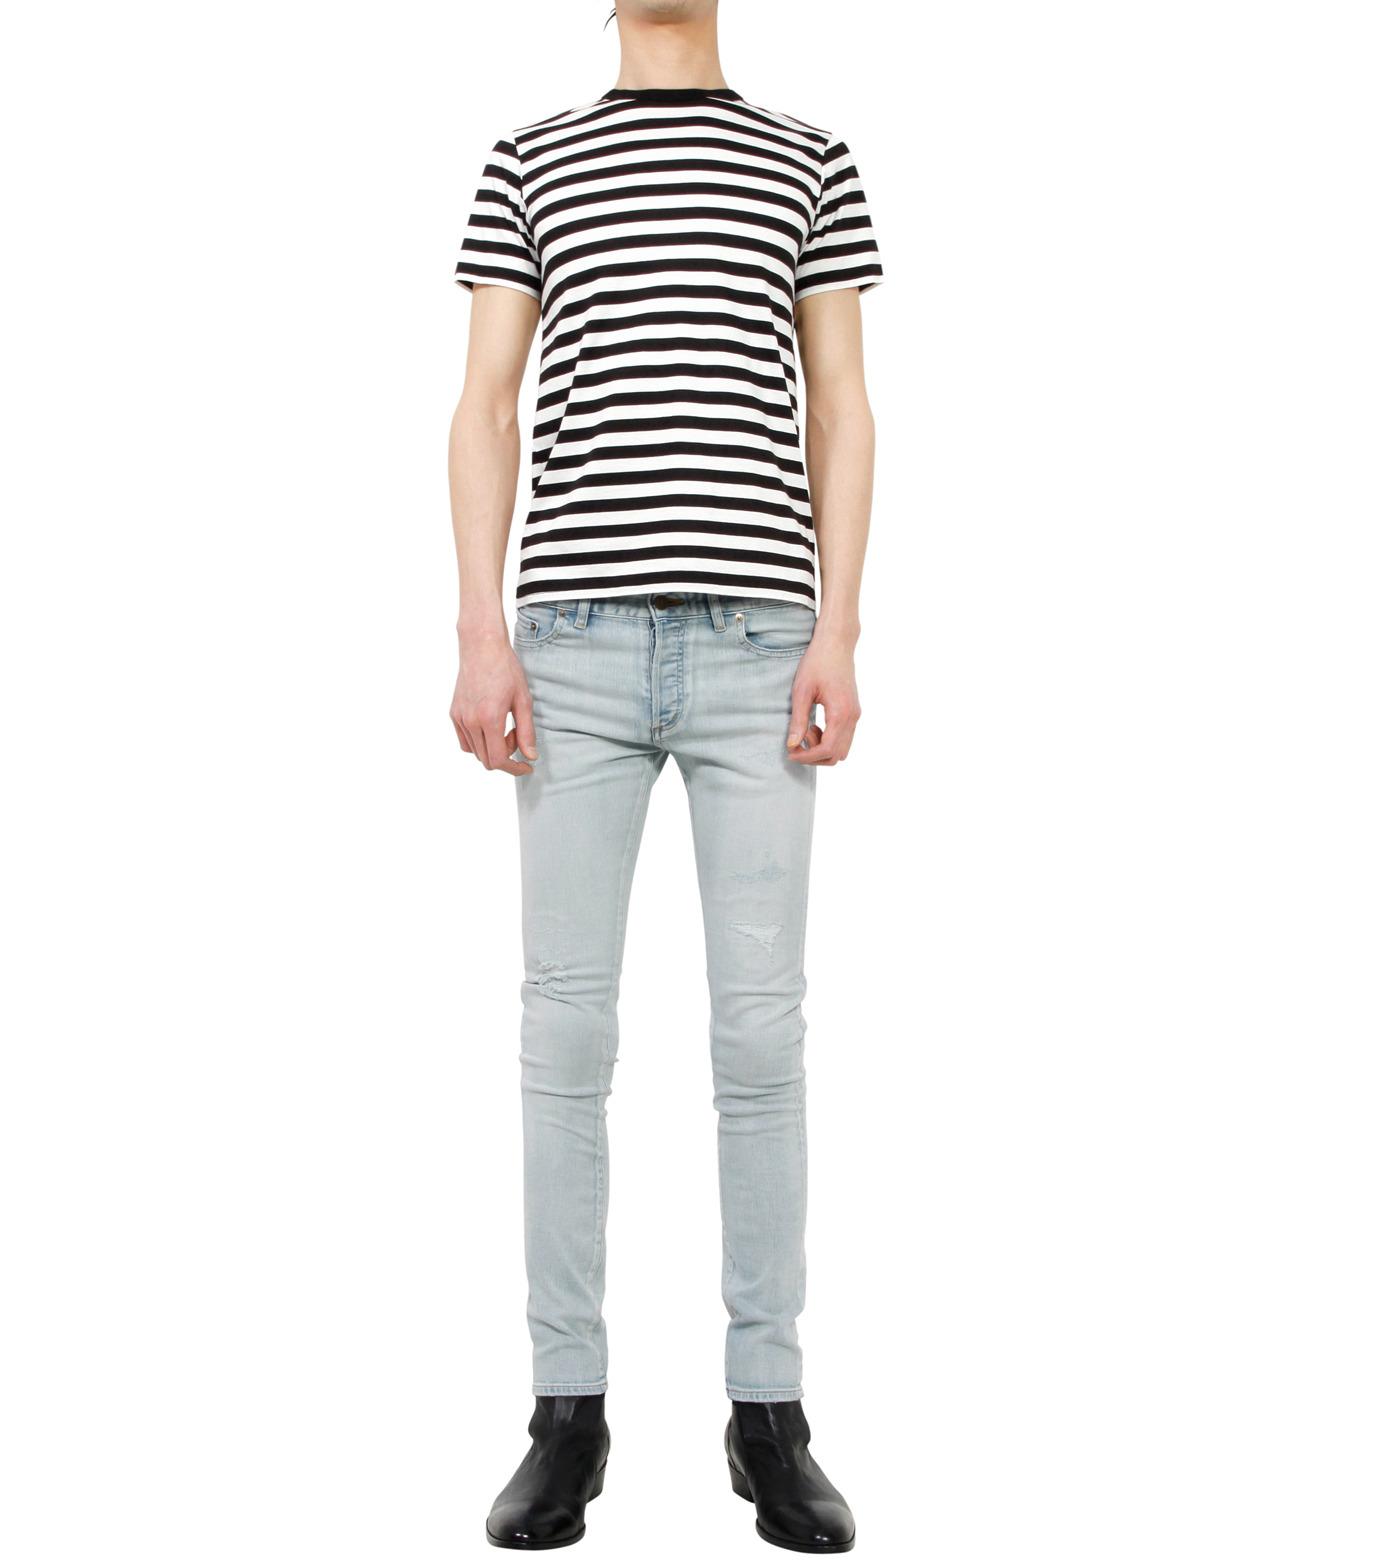 HL HEDDIE LOVU(エイチエル・エディールーヴ)のbleach skin slim-LIGHT BLUE(パンツ/pants)-18S98001-91 拡大詳細画像3